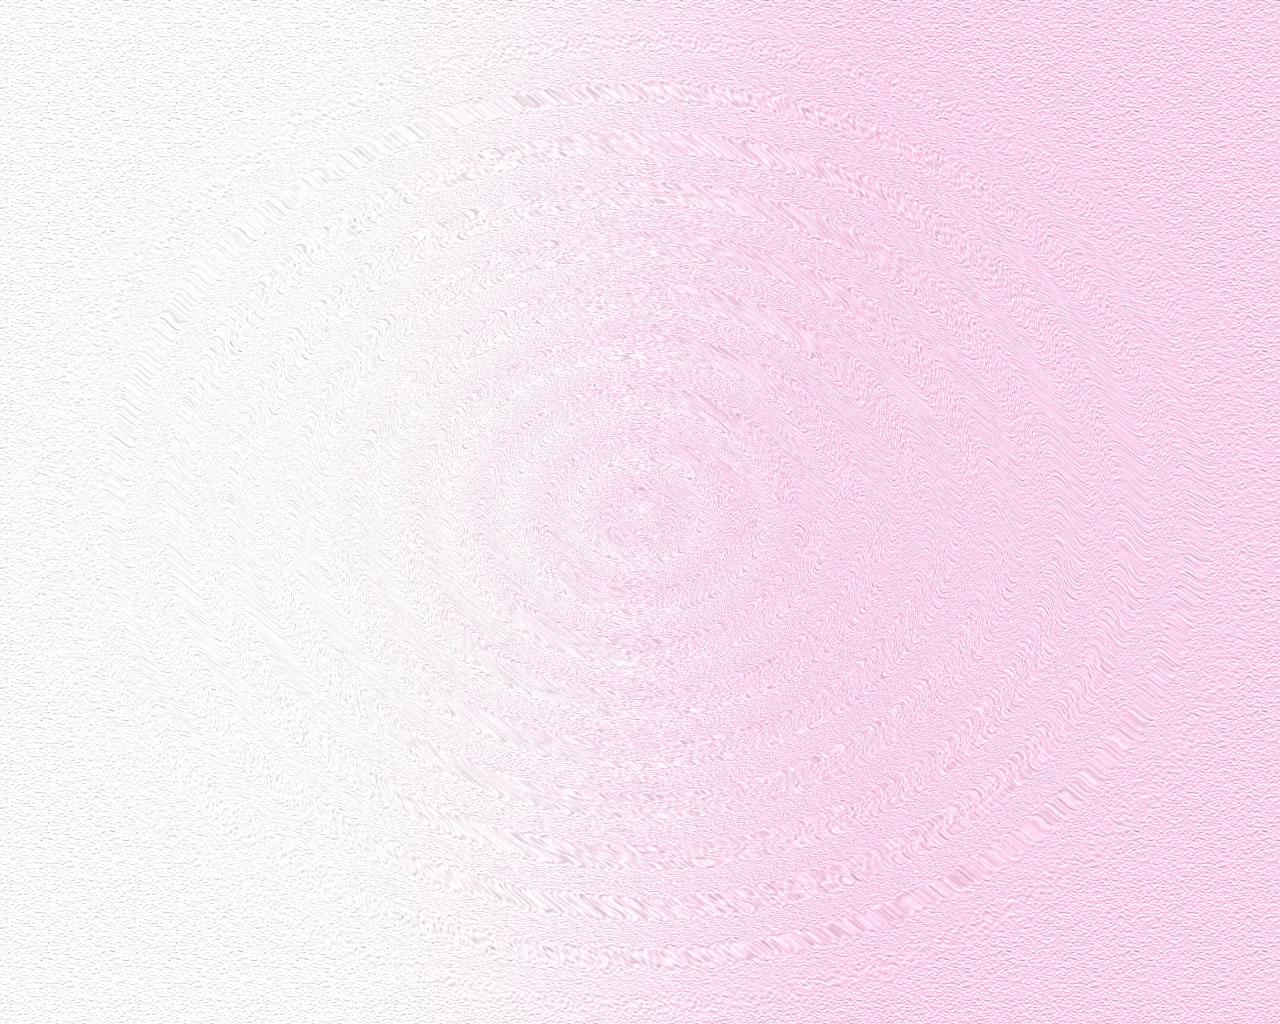 FULL WALLPAPER: Baby pink wallpaper